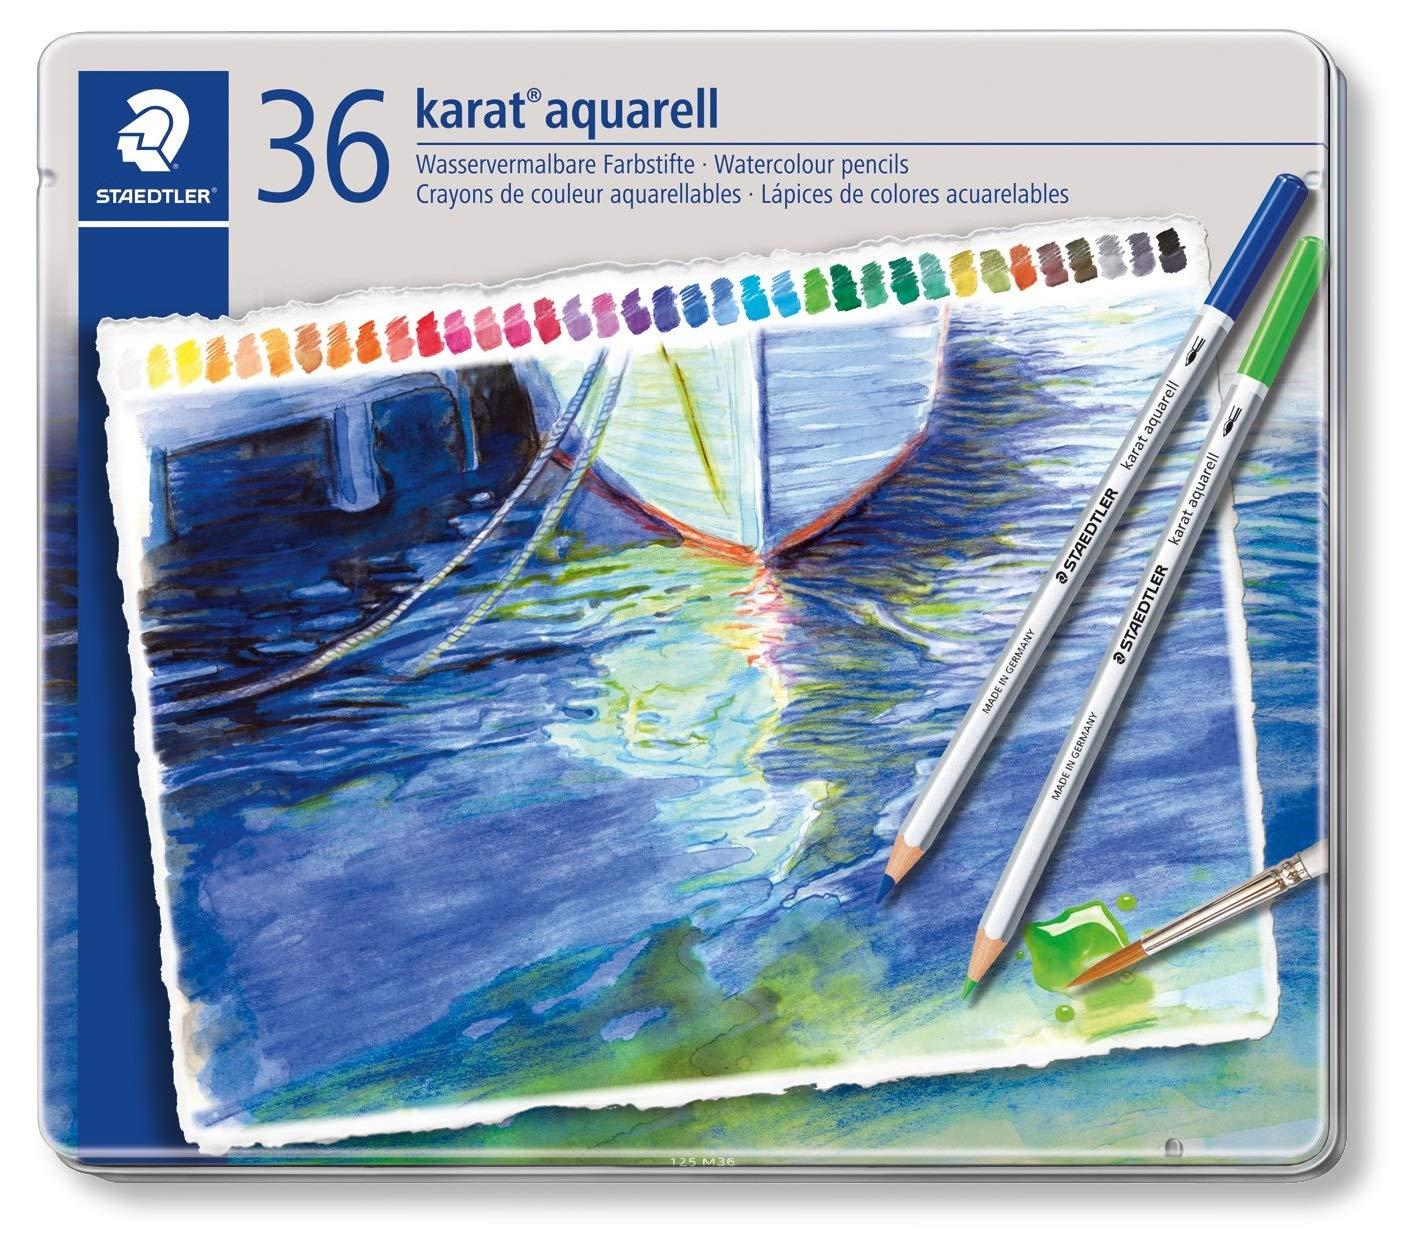 Set 125 M36 36 Colors Staedtler Dilshan Watercolor Pencil by STAEDTLER